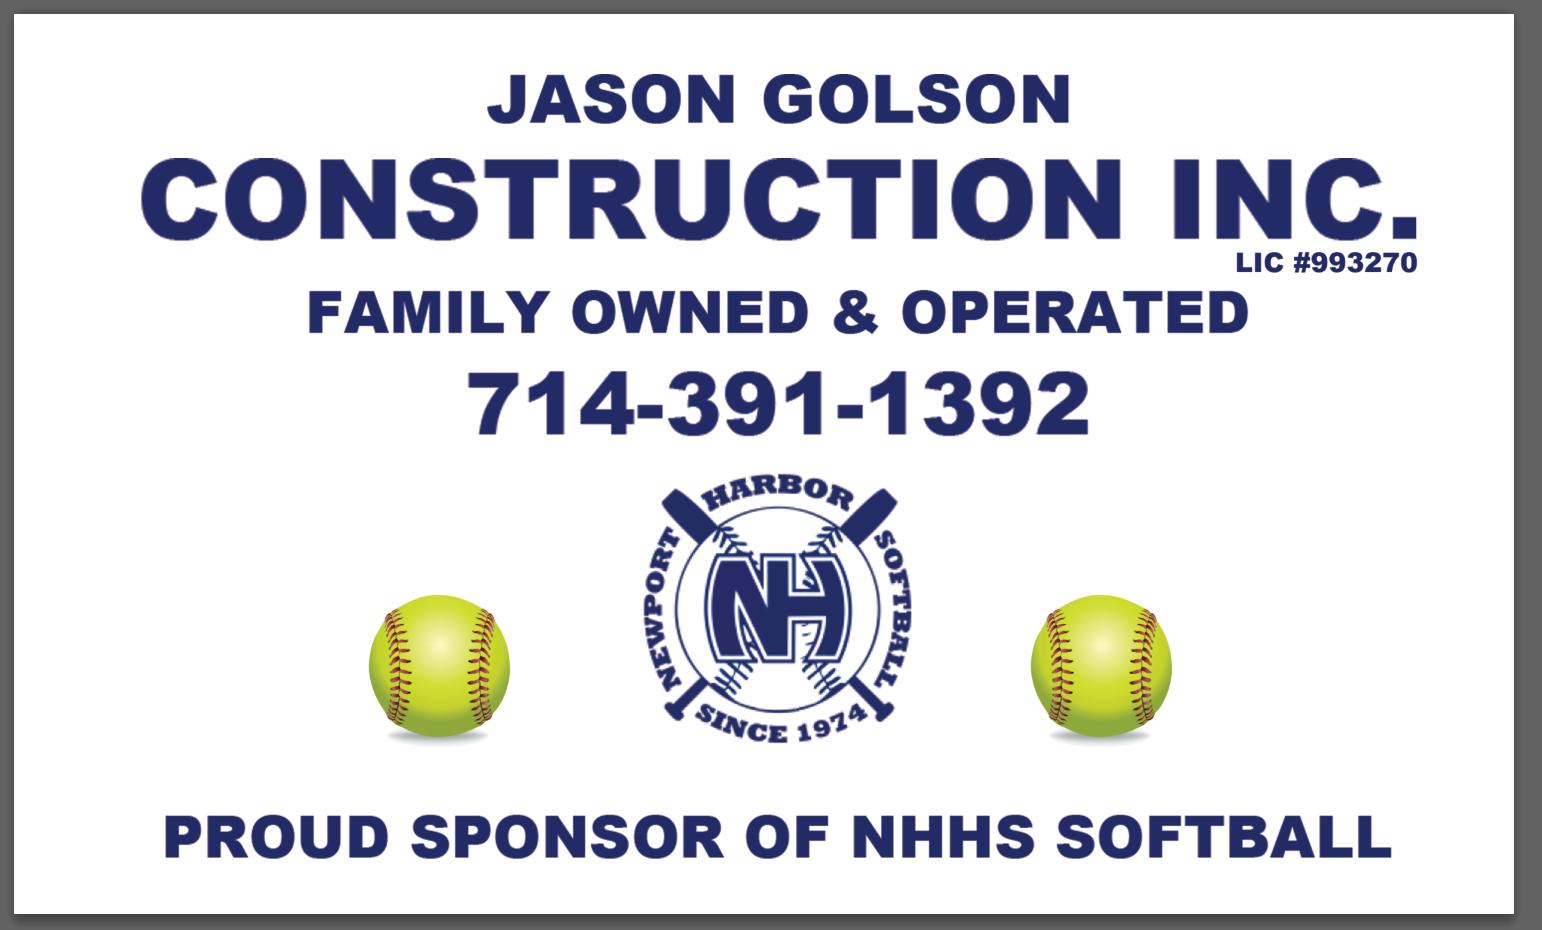 Golson Construction